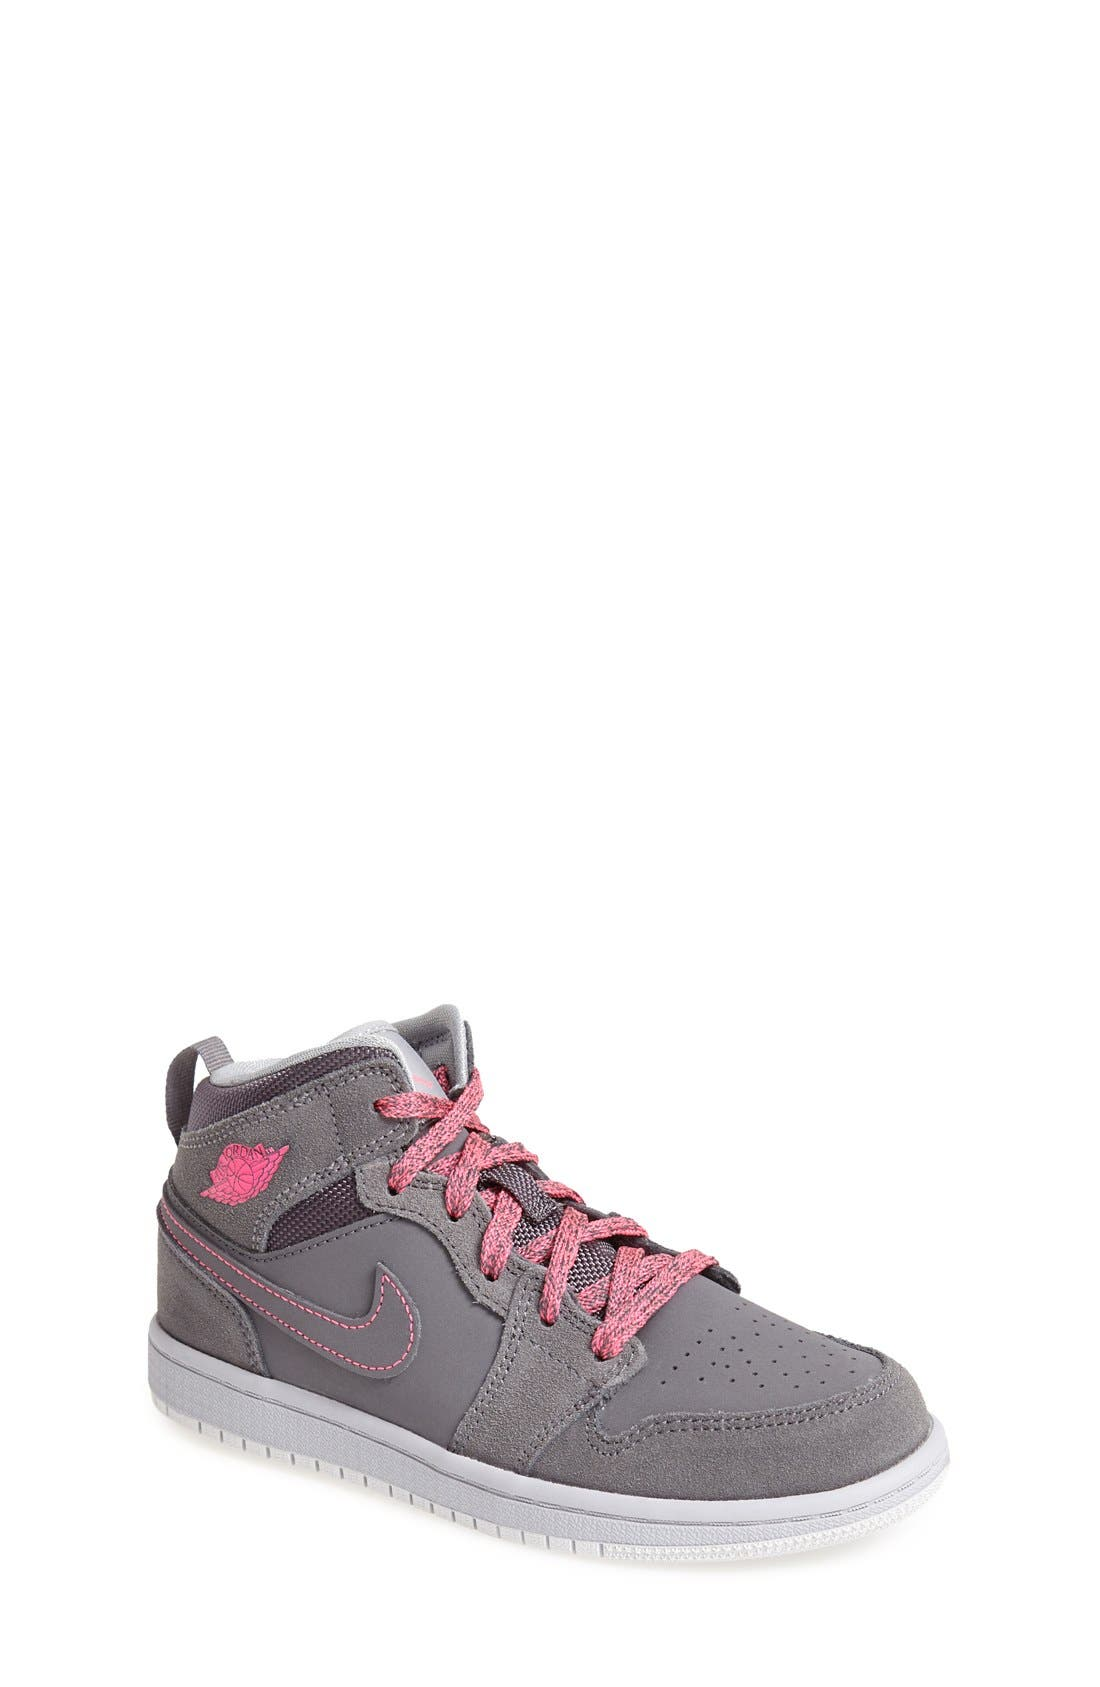 Main Image - Nike 'Air Jordan 1 Mid' Sneaker (Toddler & Little Kid)